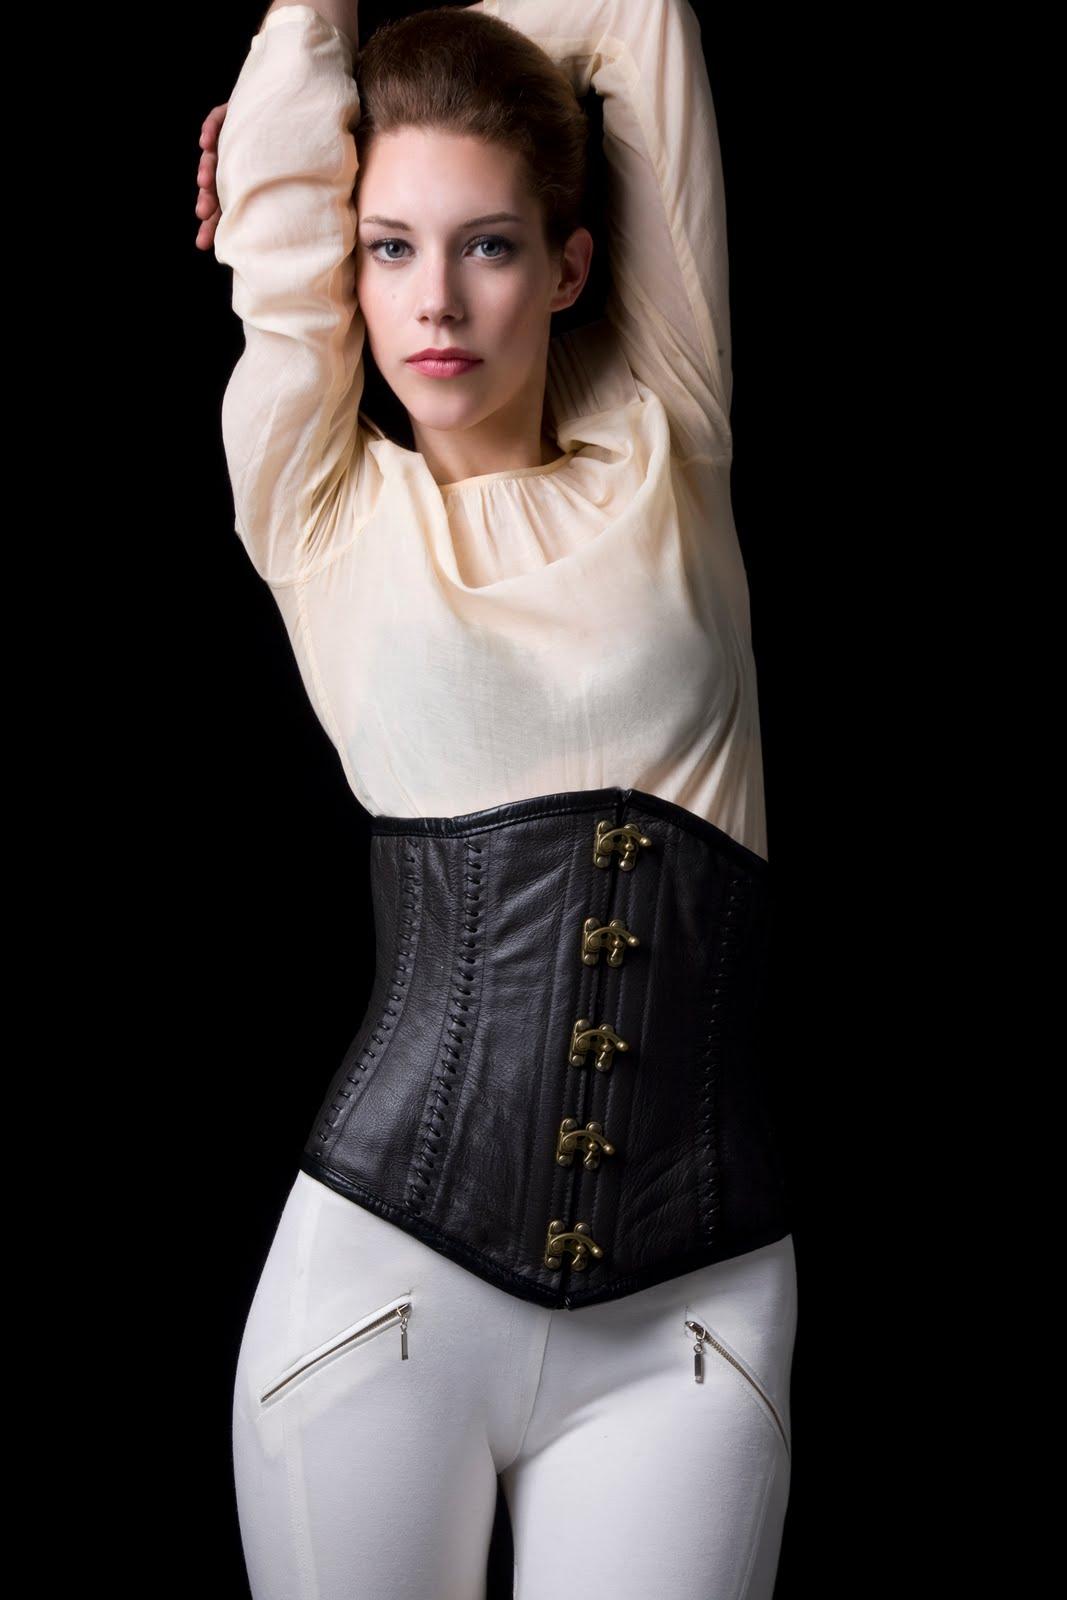 fashion stylist sydney le magazine issue four le femme fatale shoot no1 fatale instinct. Black Bedroom Furniture Sets. Home Design Ideas